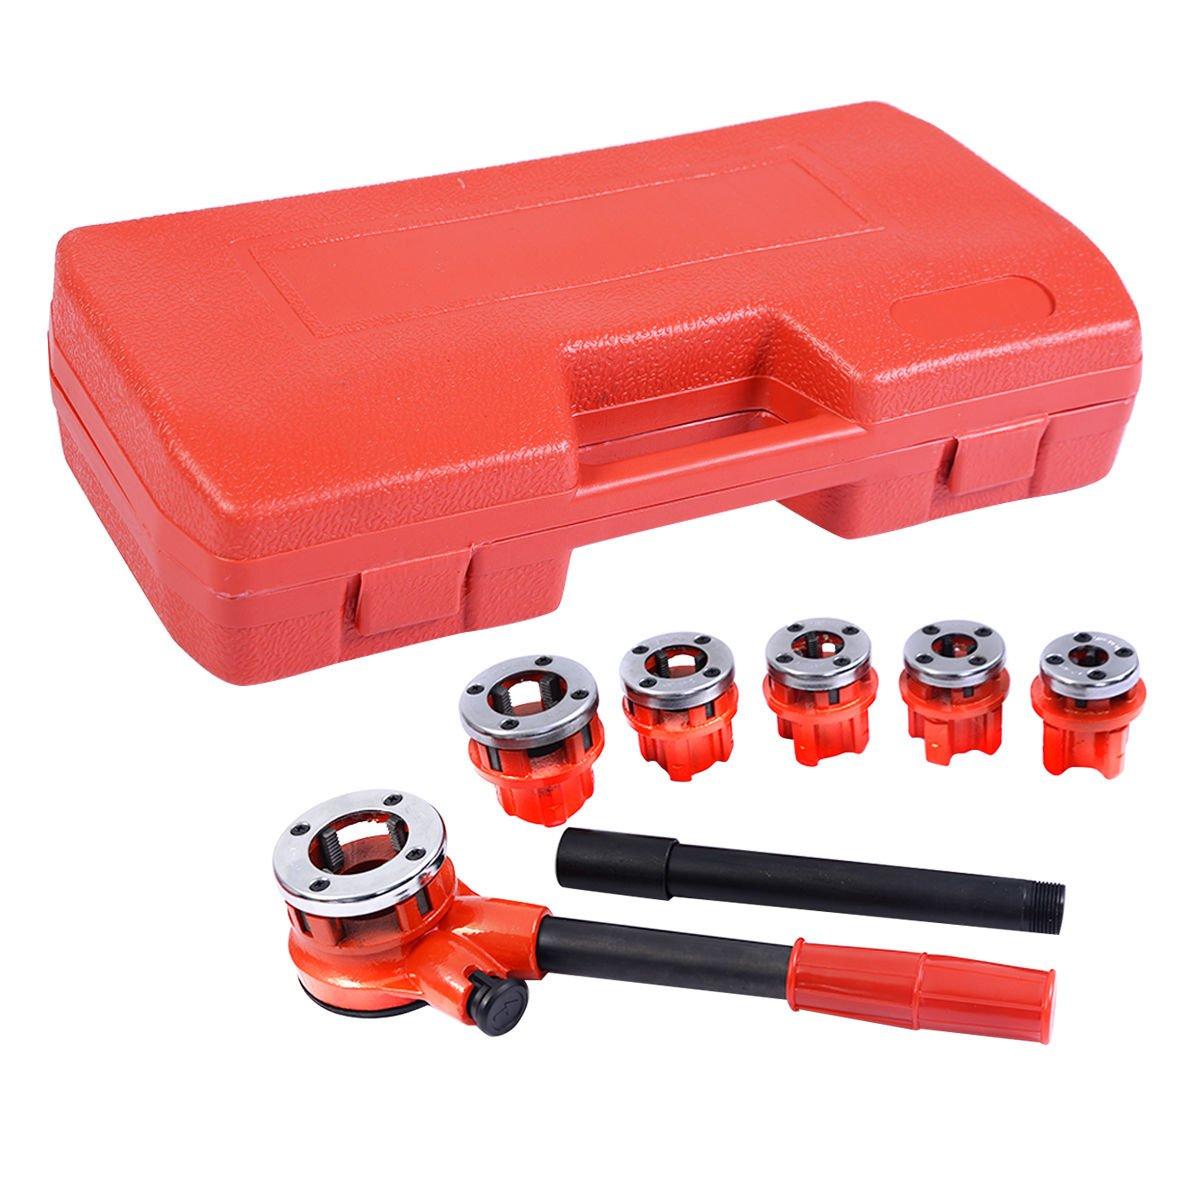 Goplus Ratchet Pipe Threader Kit Ratcheting Pipe Threading Tool Set w/ 6 Dies and Storage Case